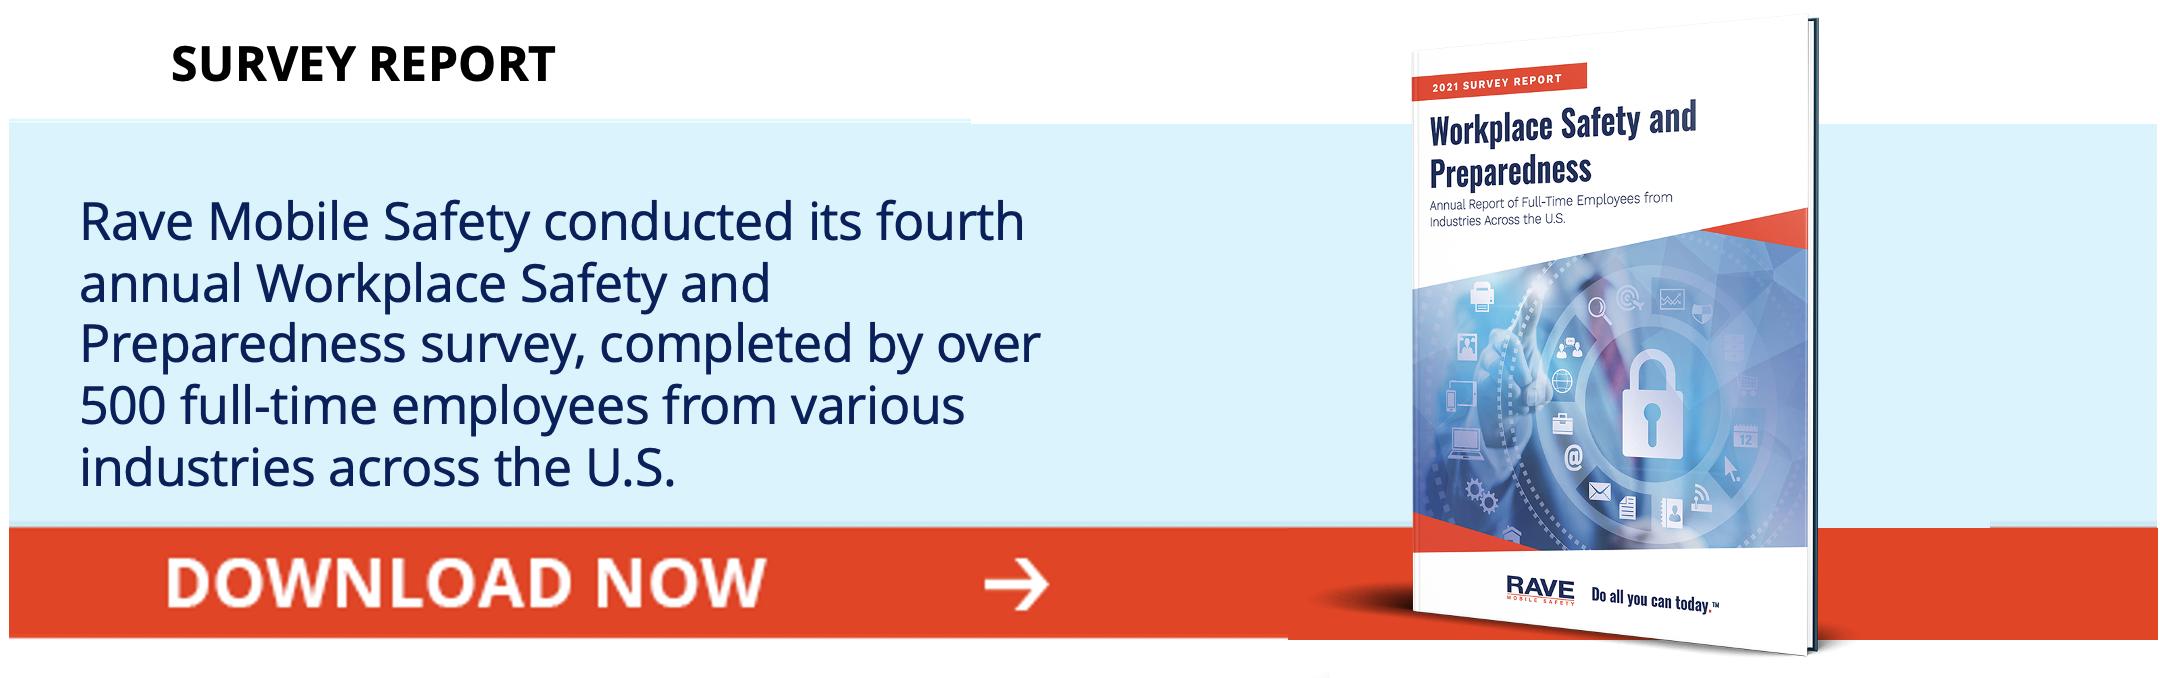 light blue rectangle survey report